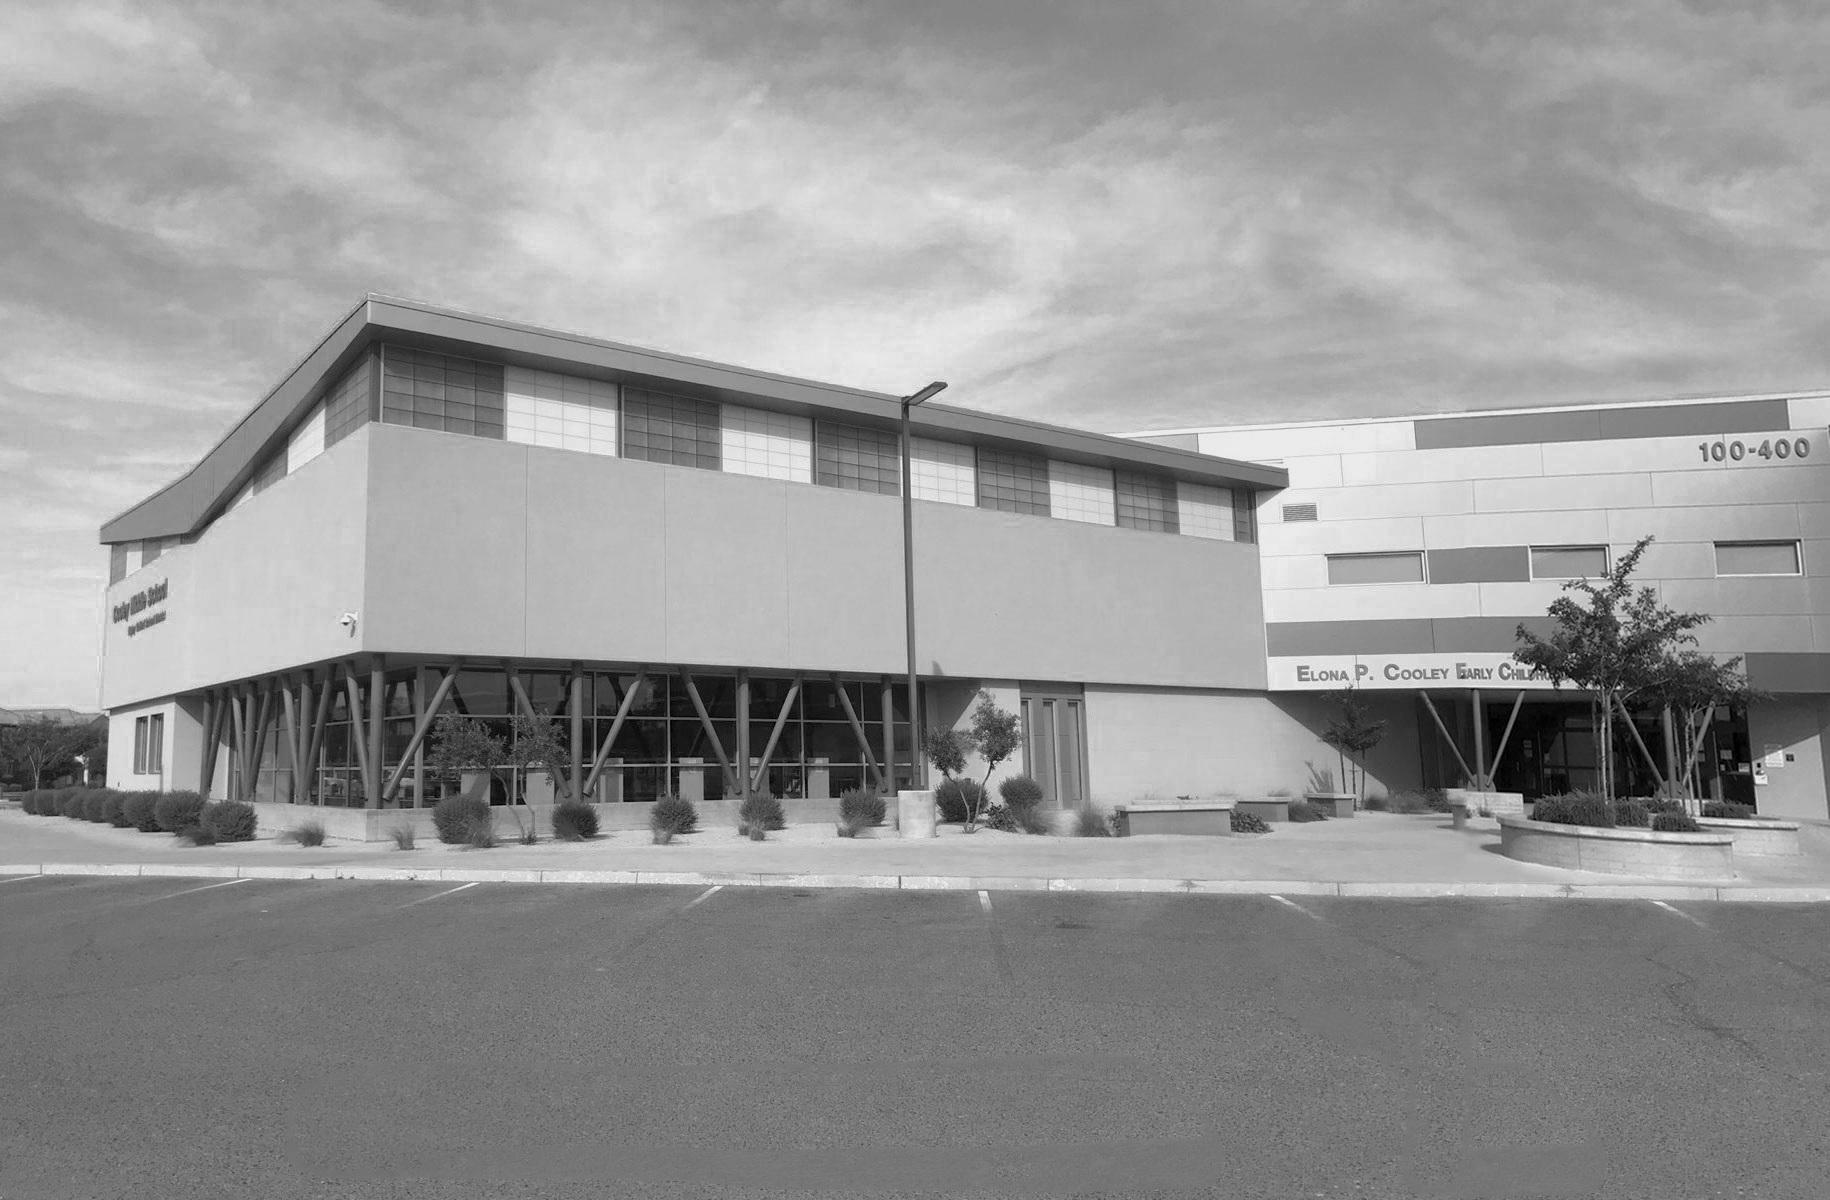 Gilbert Campus(coming fall 2019) - Address:Cooley Middle School1100 S Recker Rd,Gilbert, AZ 85296Service Times:Coming Soon